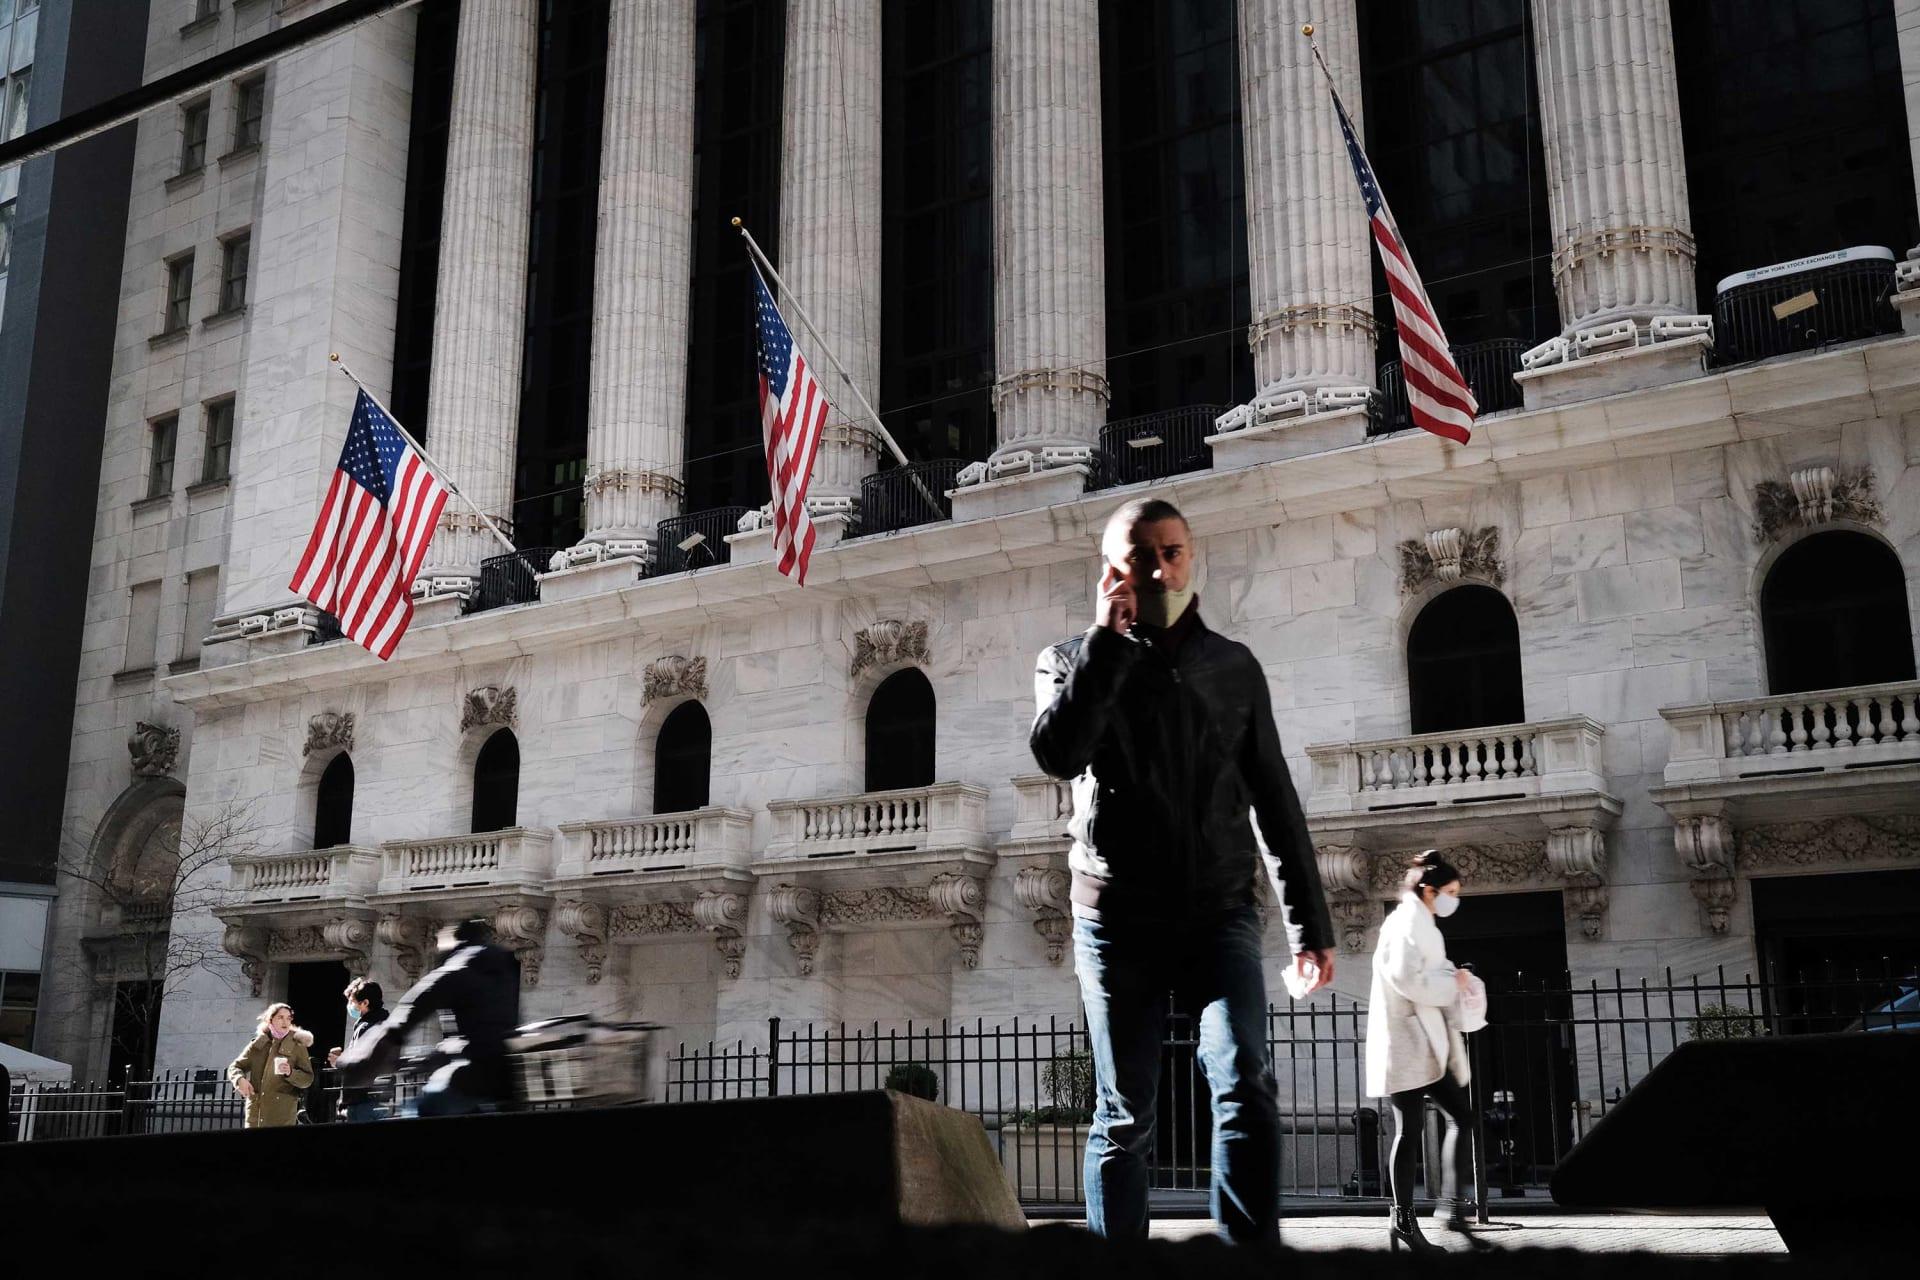 مؤشر داو جونز يسجل أفضل أداء شهري له منذ 1987